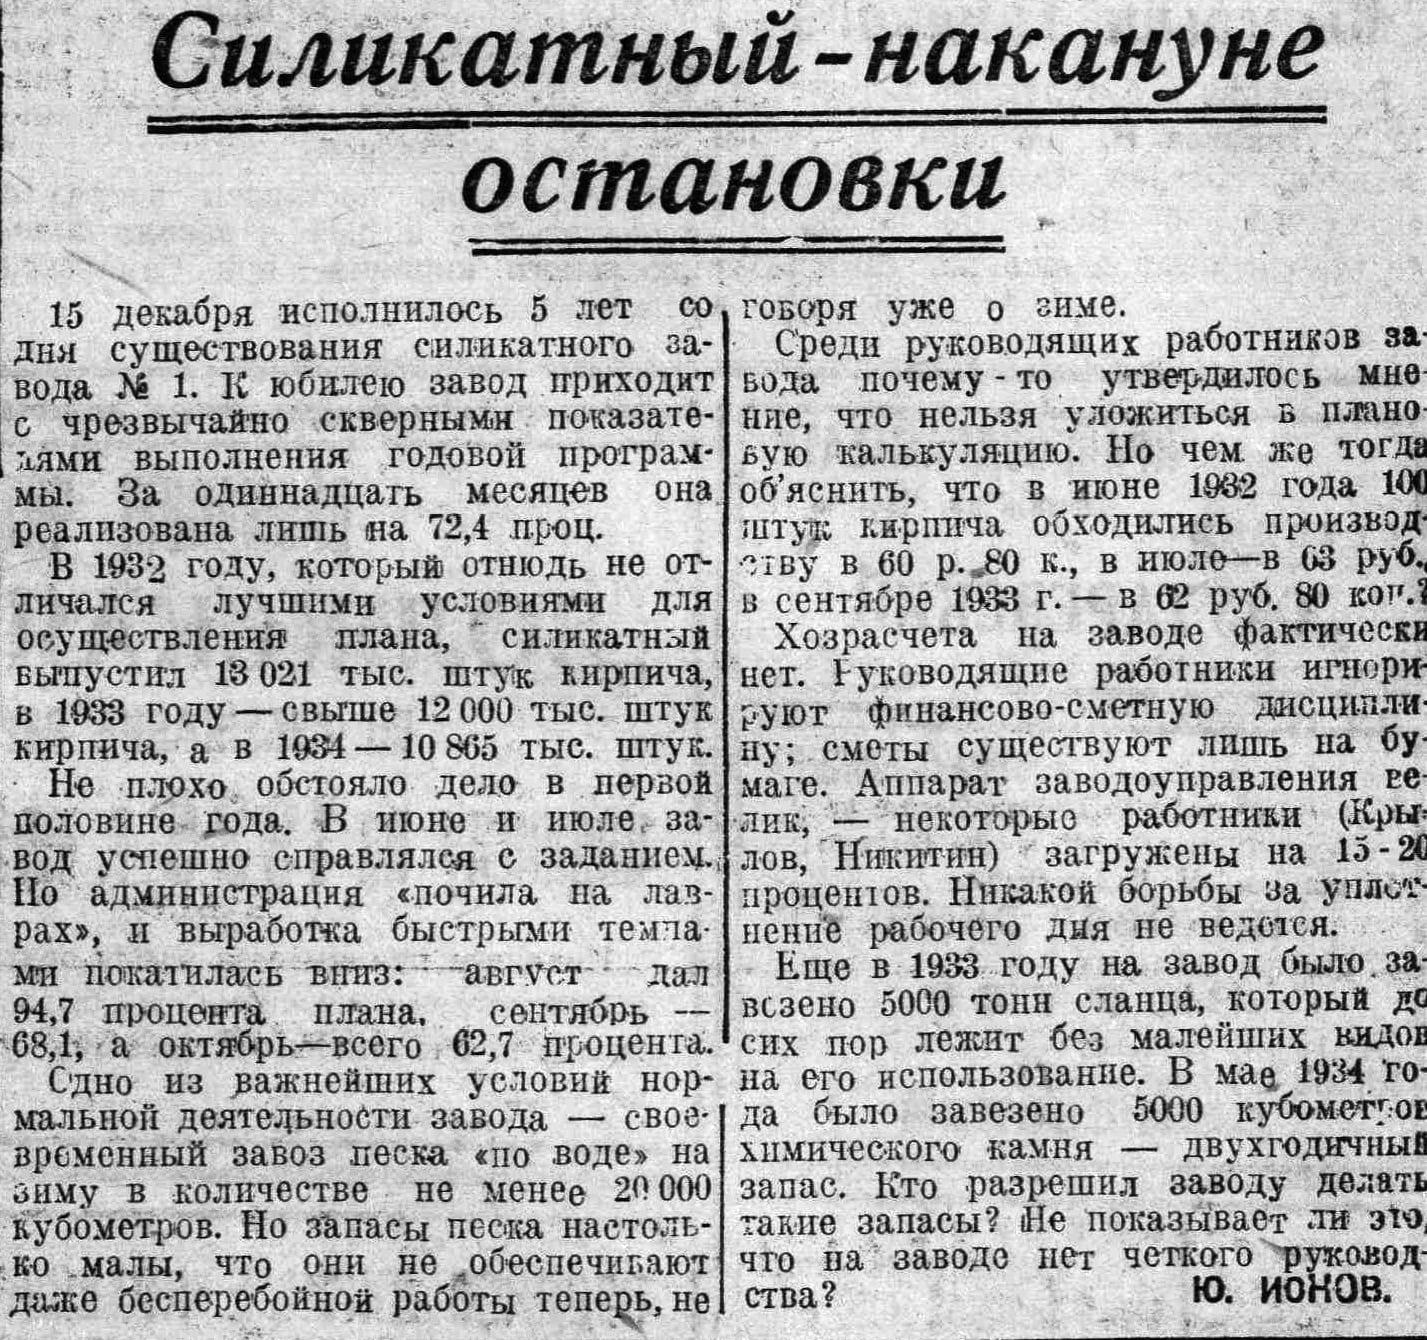 Соколова-ФОТО-10-ВКа-1934-12-16-пробл. силикат. завода